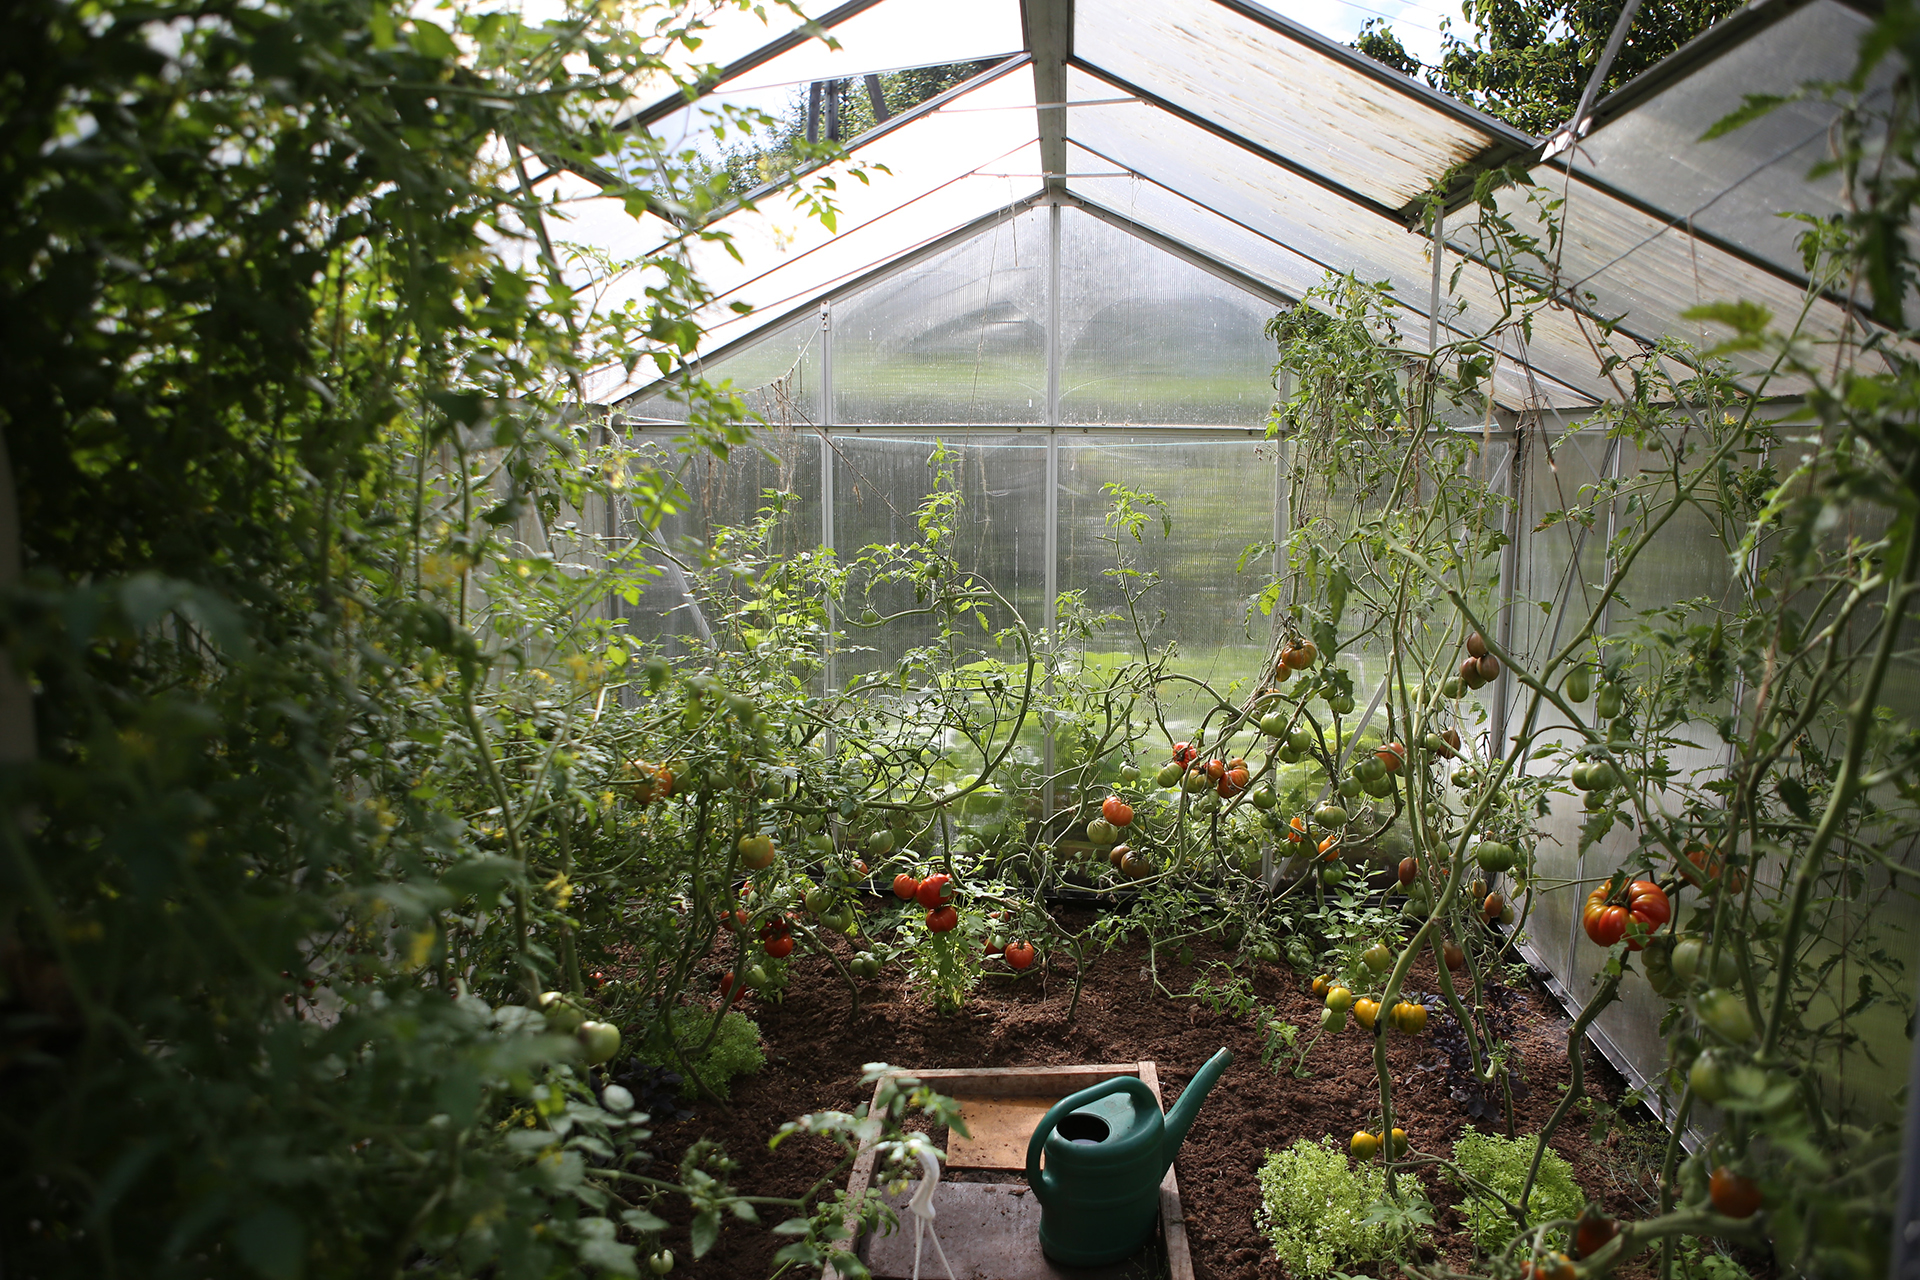 odla i växthuset